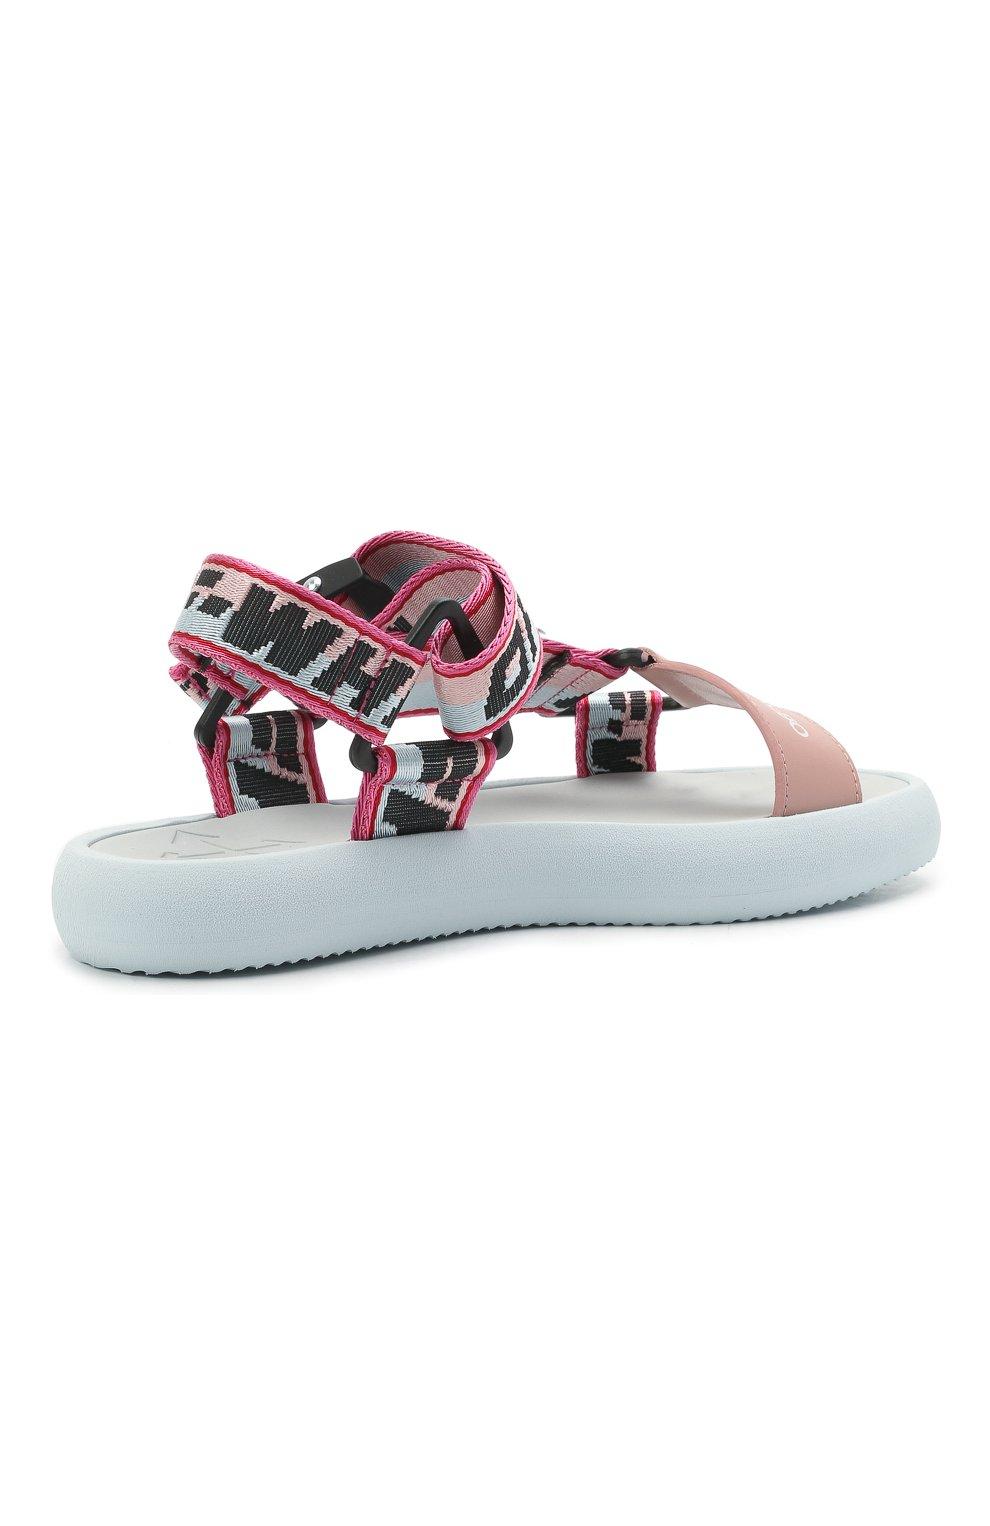 Женские текстильные сандалии OFF-WHITE розового цвета, арт. 0WIH007S21FAB0014230 | Фото 4 (Материал внешний: Текстиль; Подошва: Платформа)